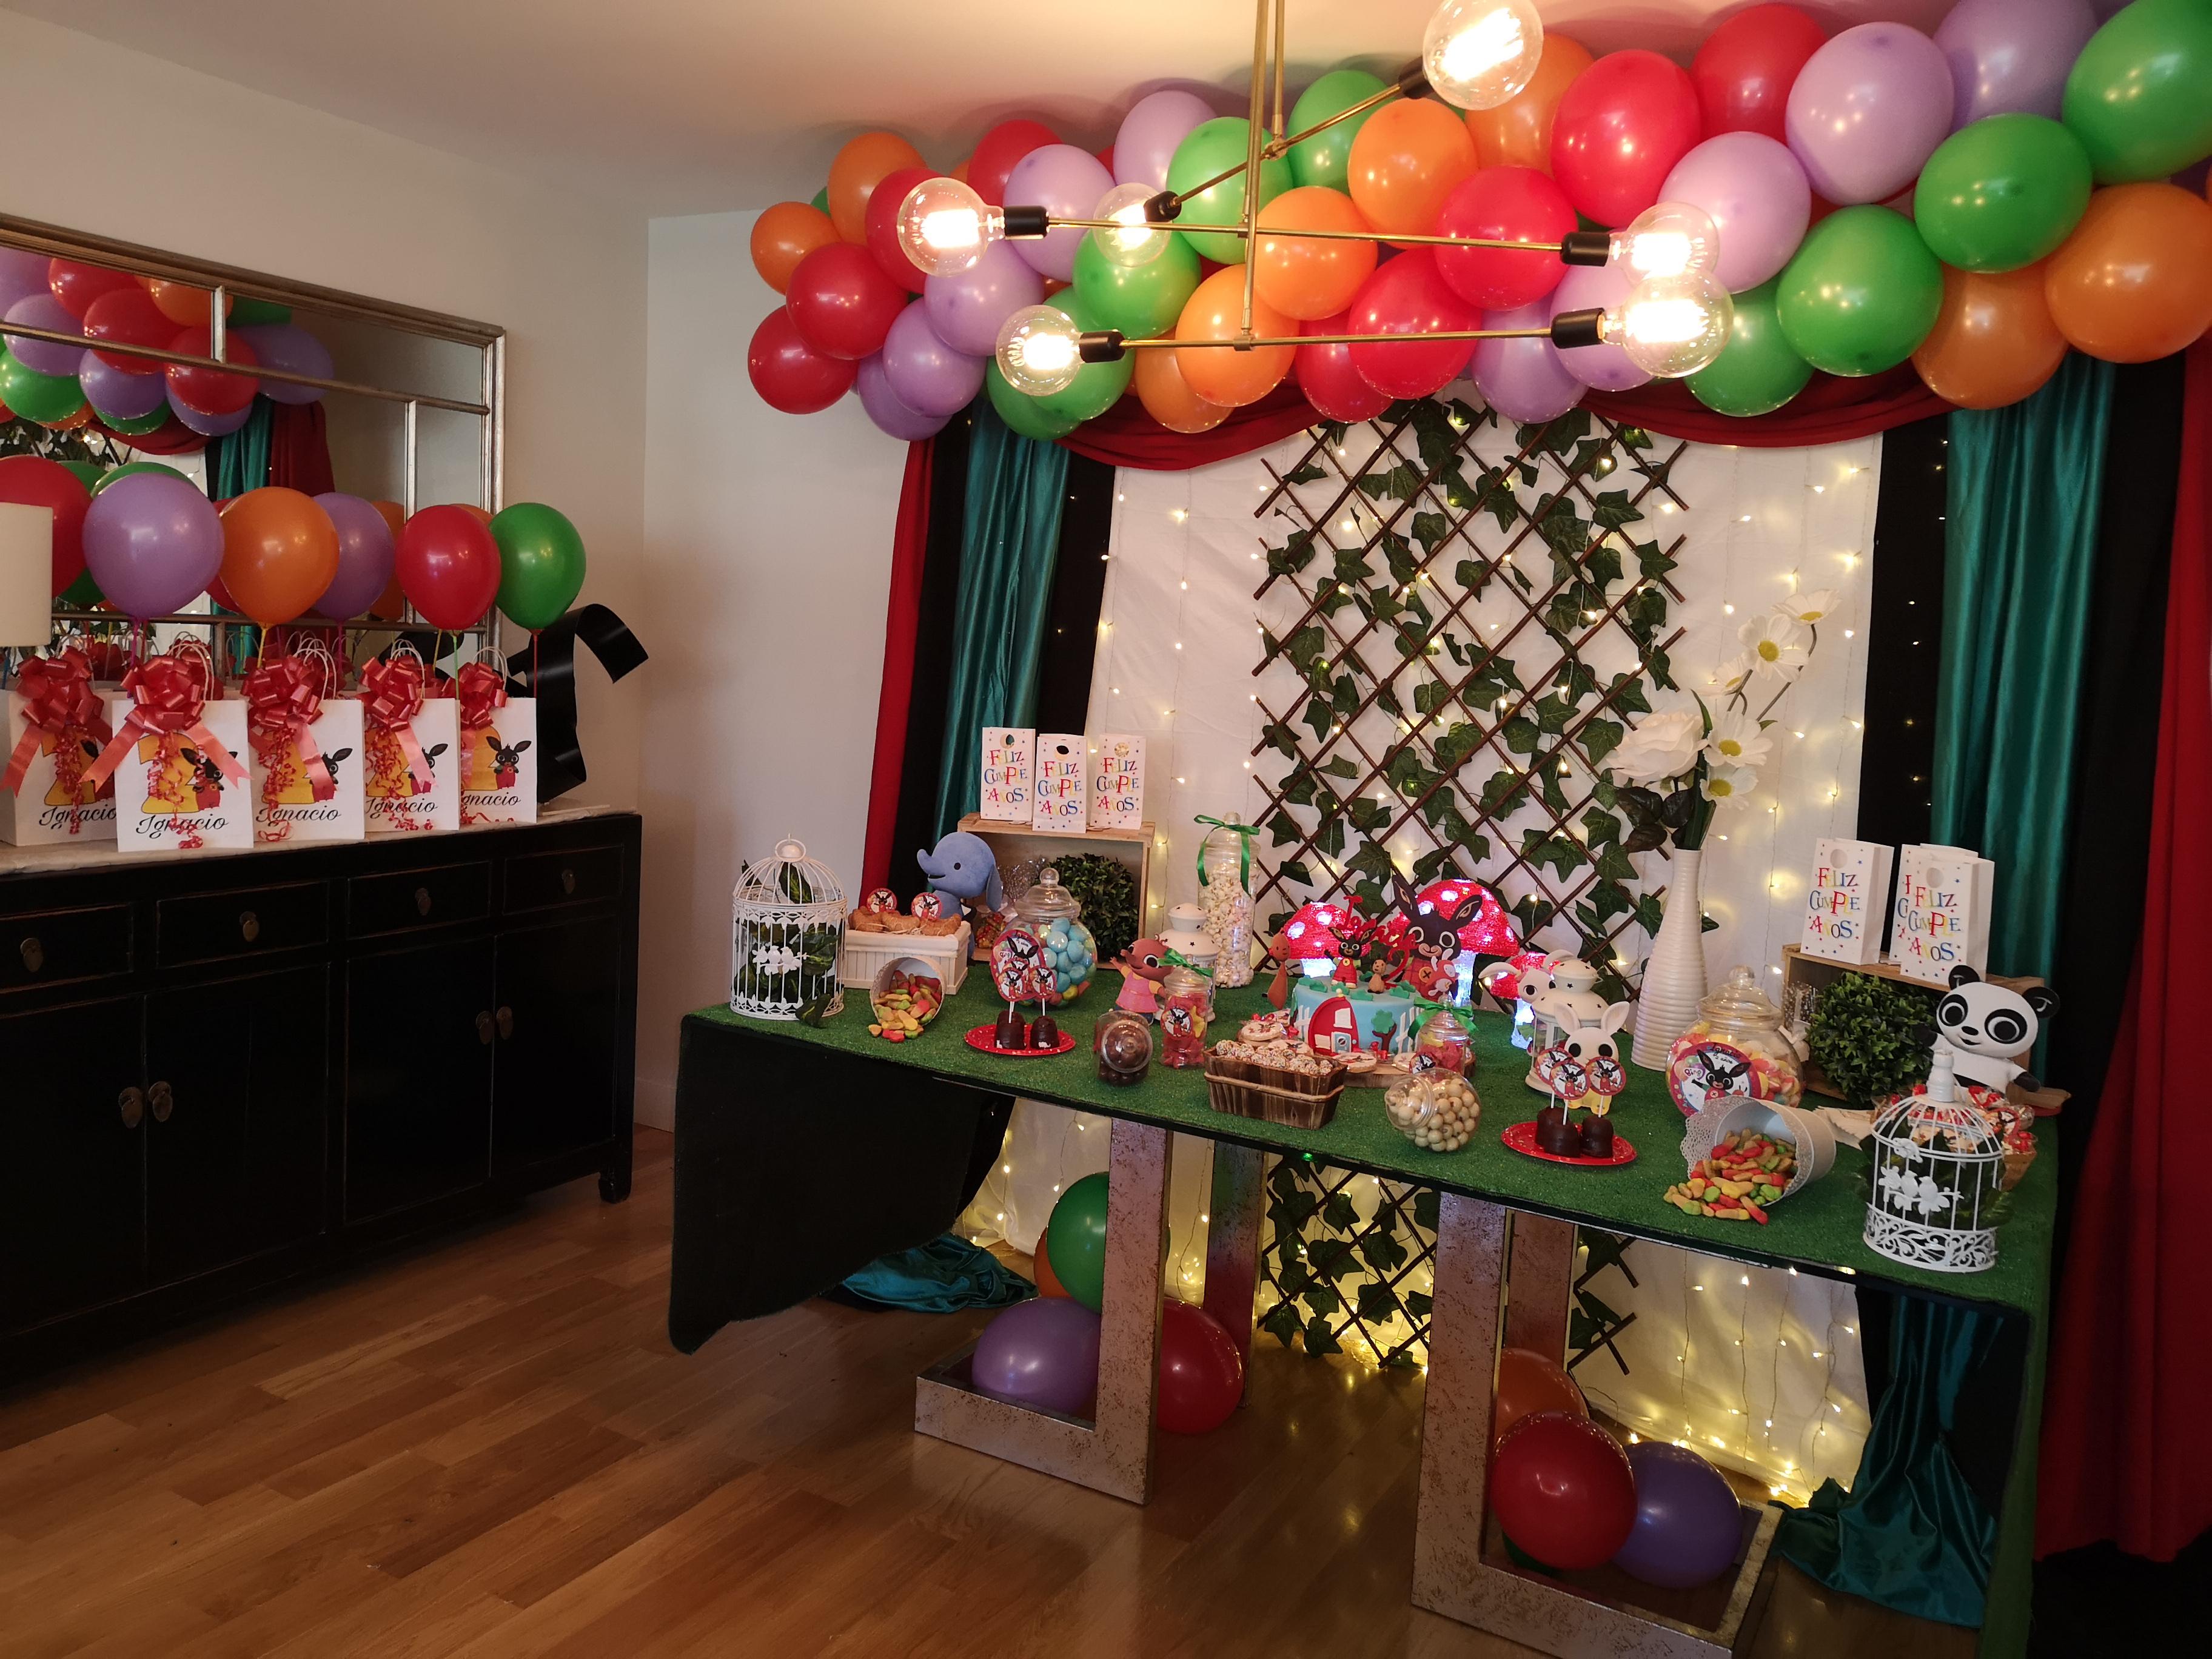 eventelove cumpleaño sorpresa conejito bing eventplanners organizaciondecumpleaños